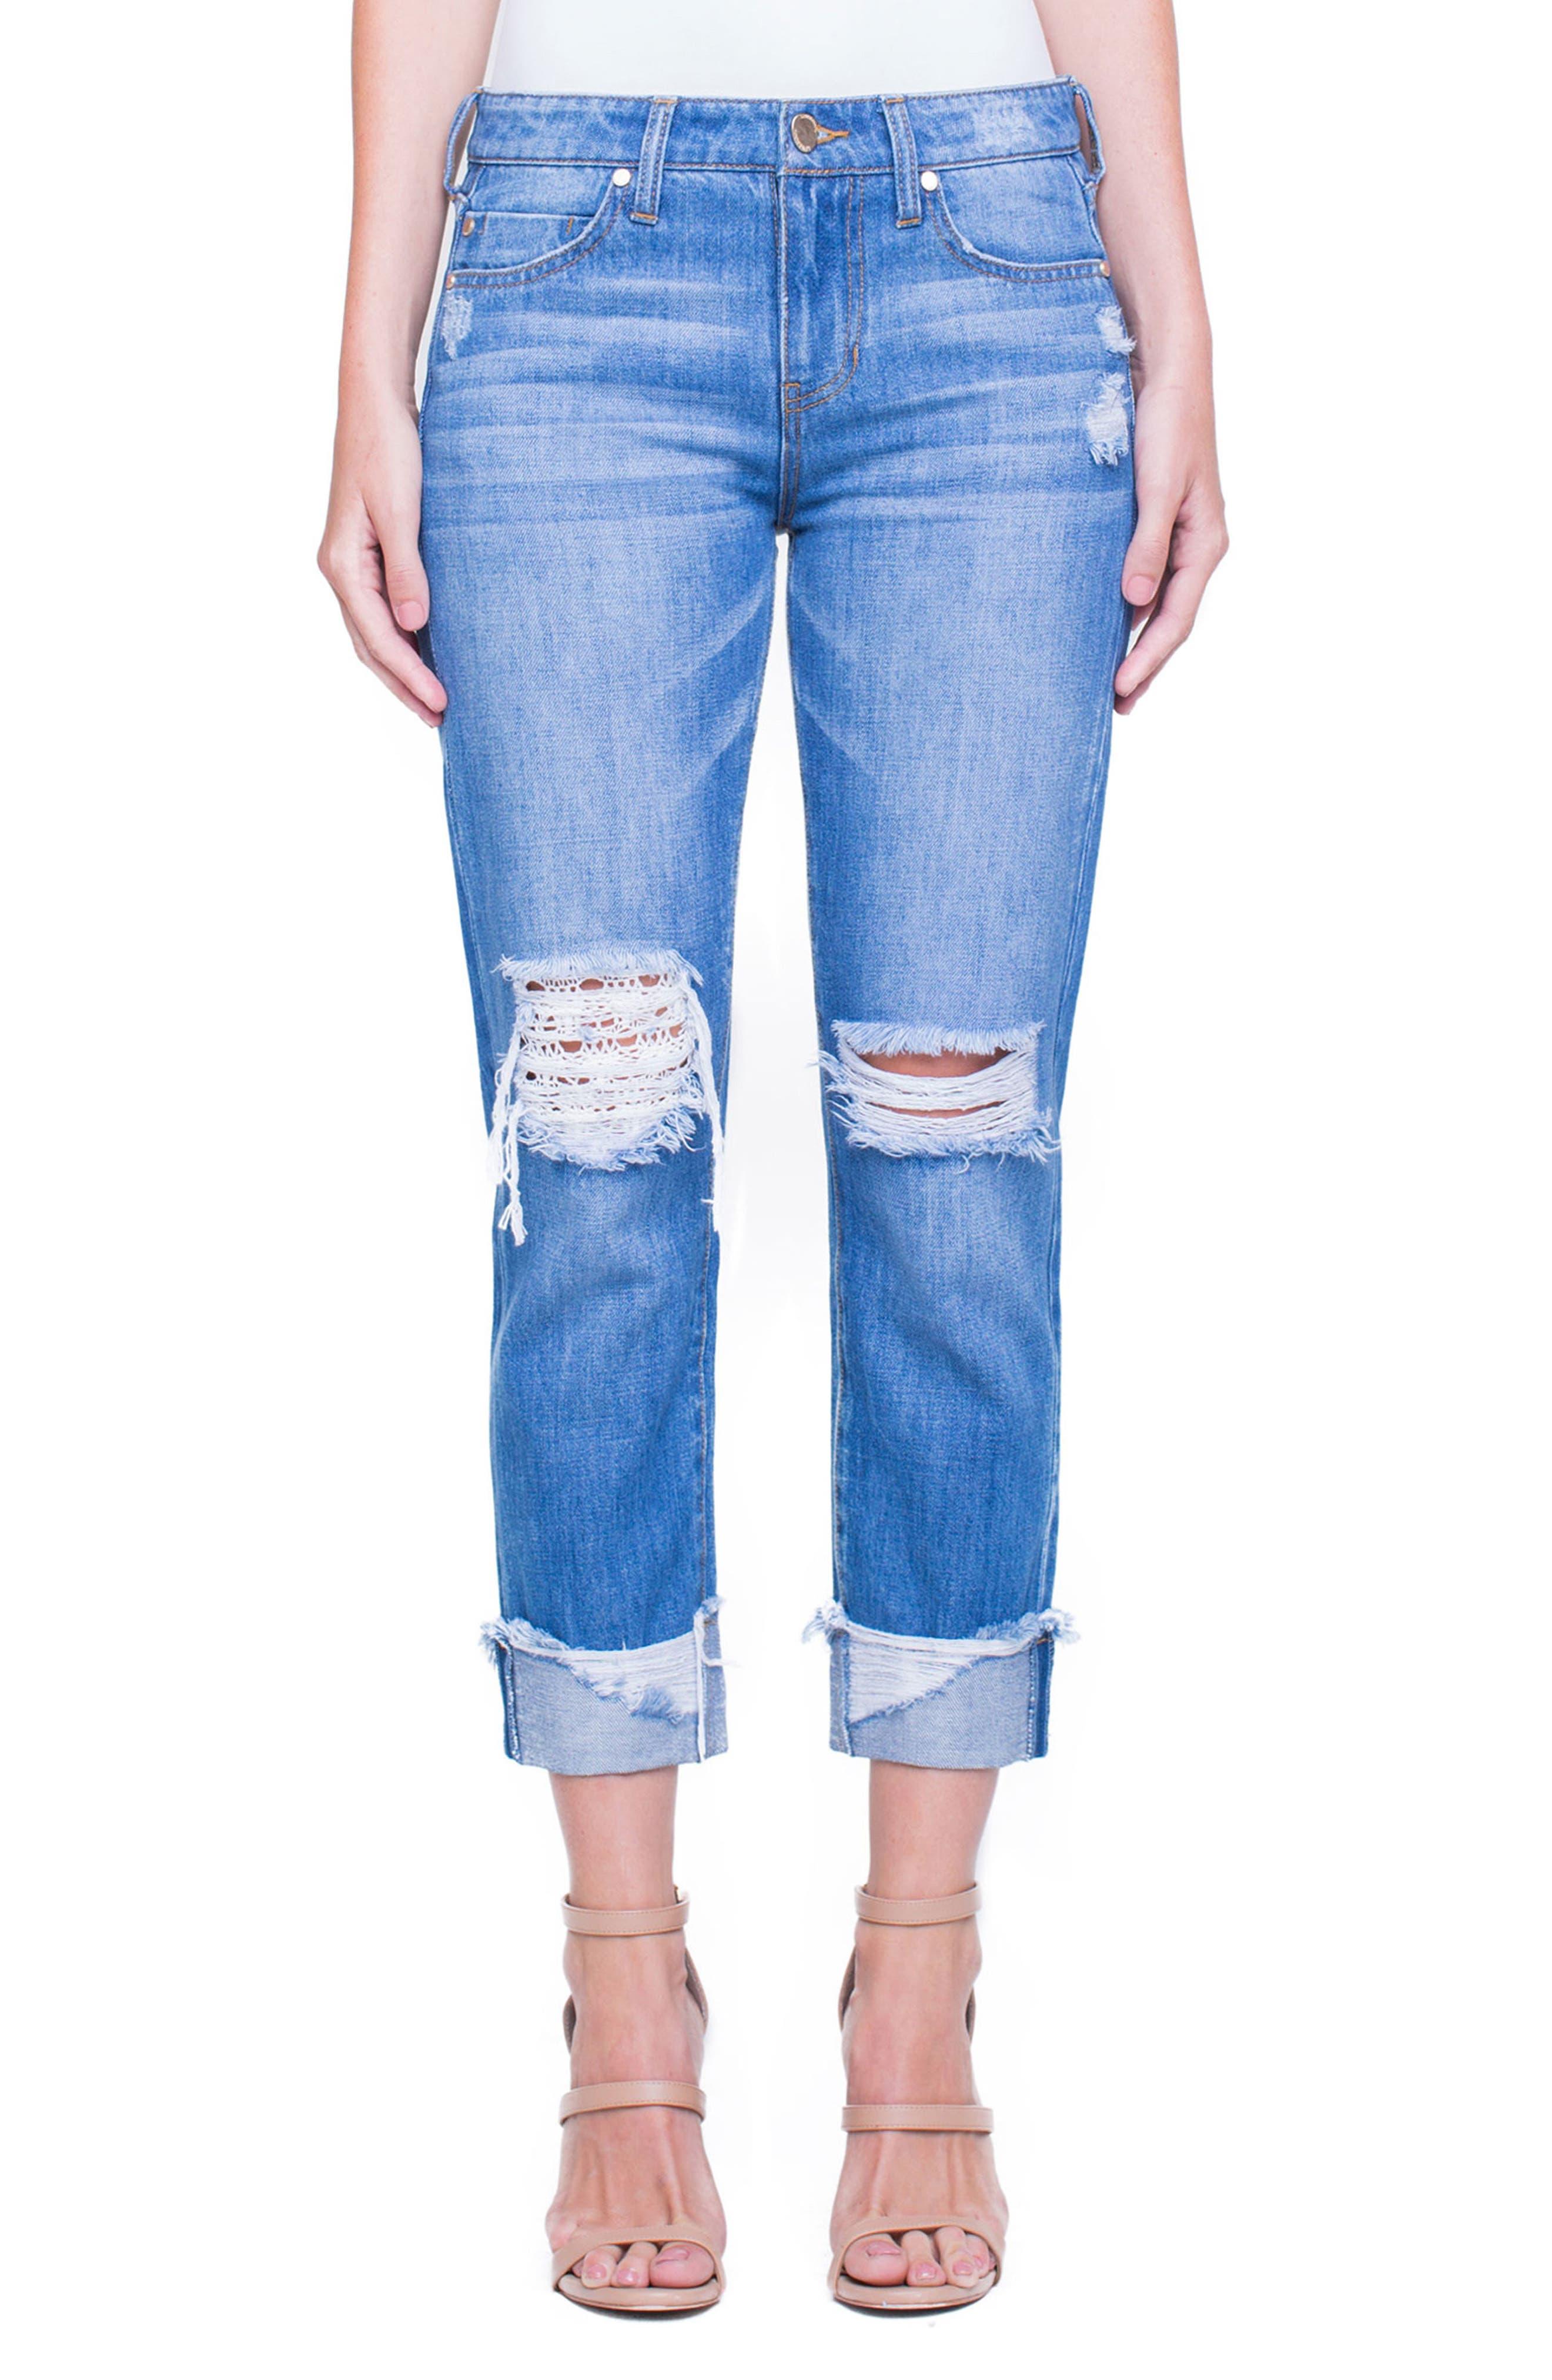 Main Image - Liverpool Jeans Company Kennedy Distressed Raw Hem Crop Boyfriend Jeans (Destruct)